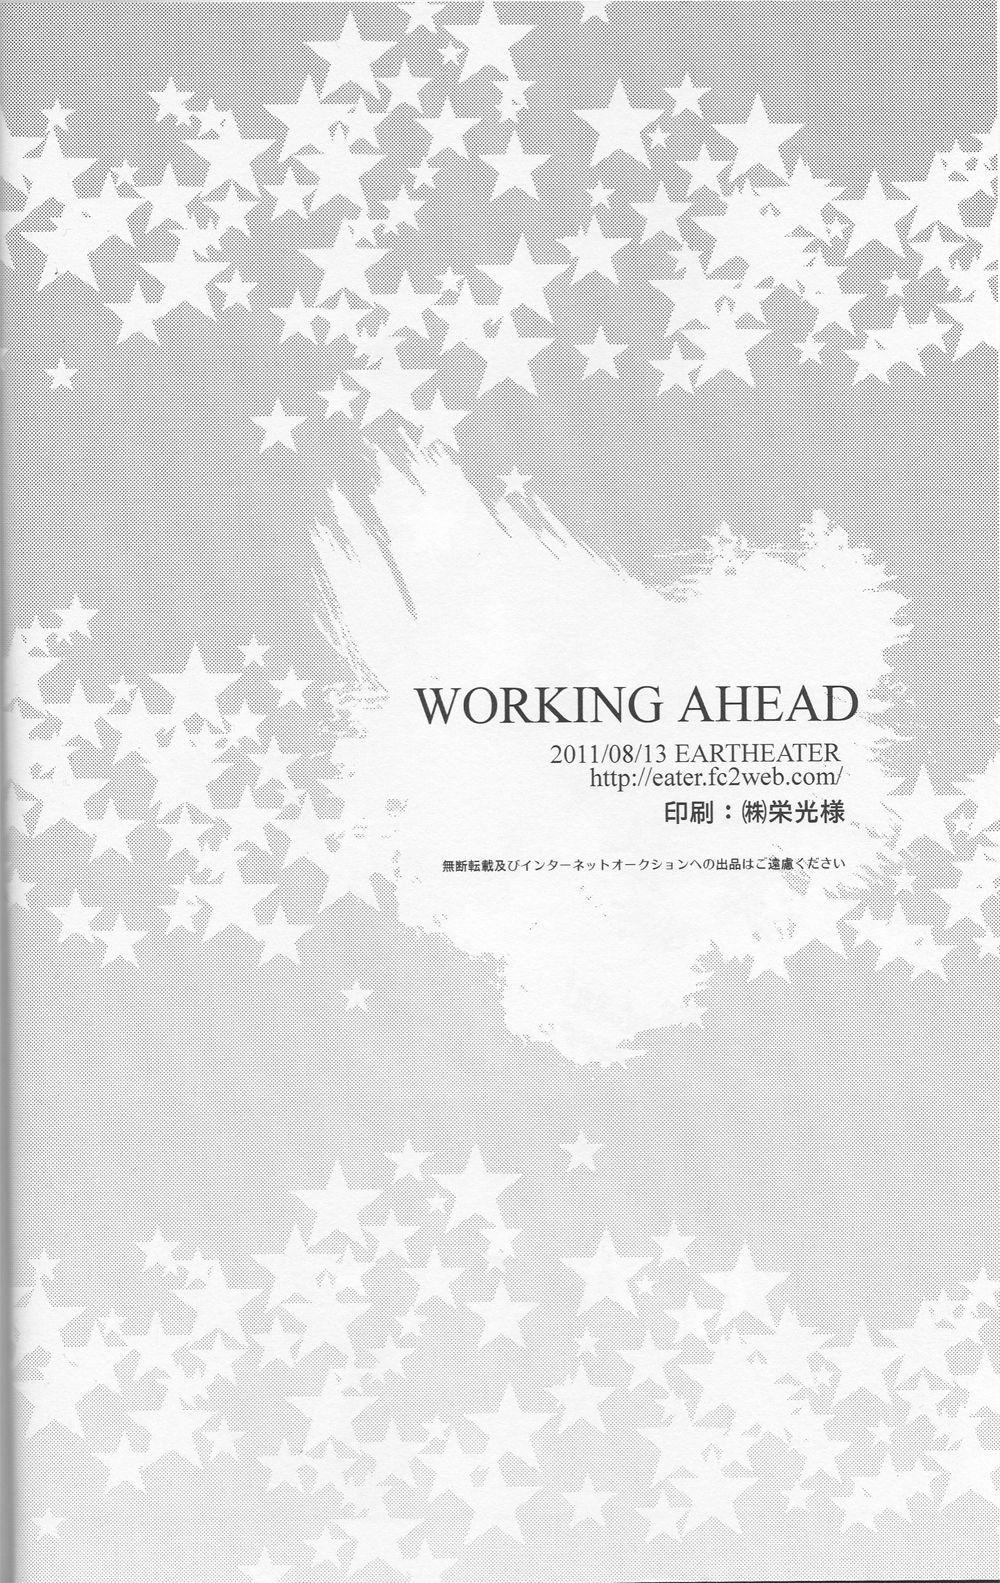 WORKING AHEAD 33